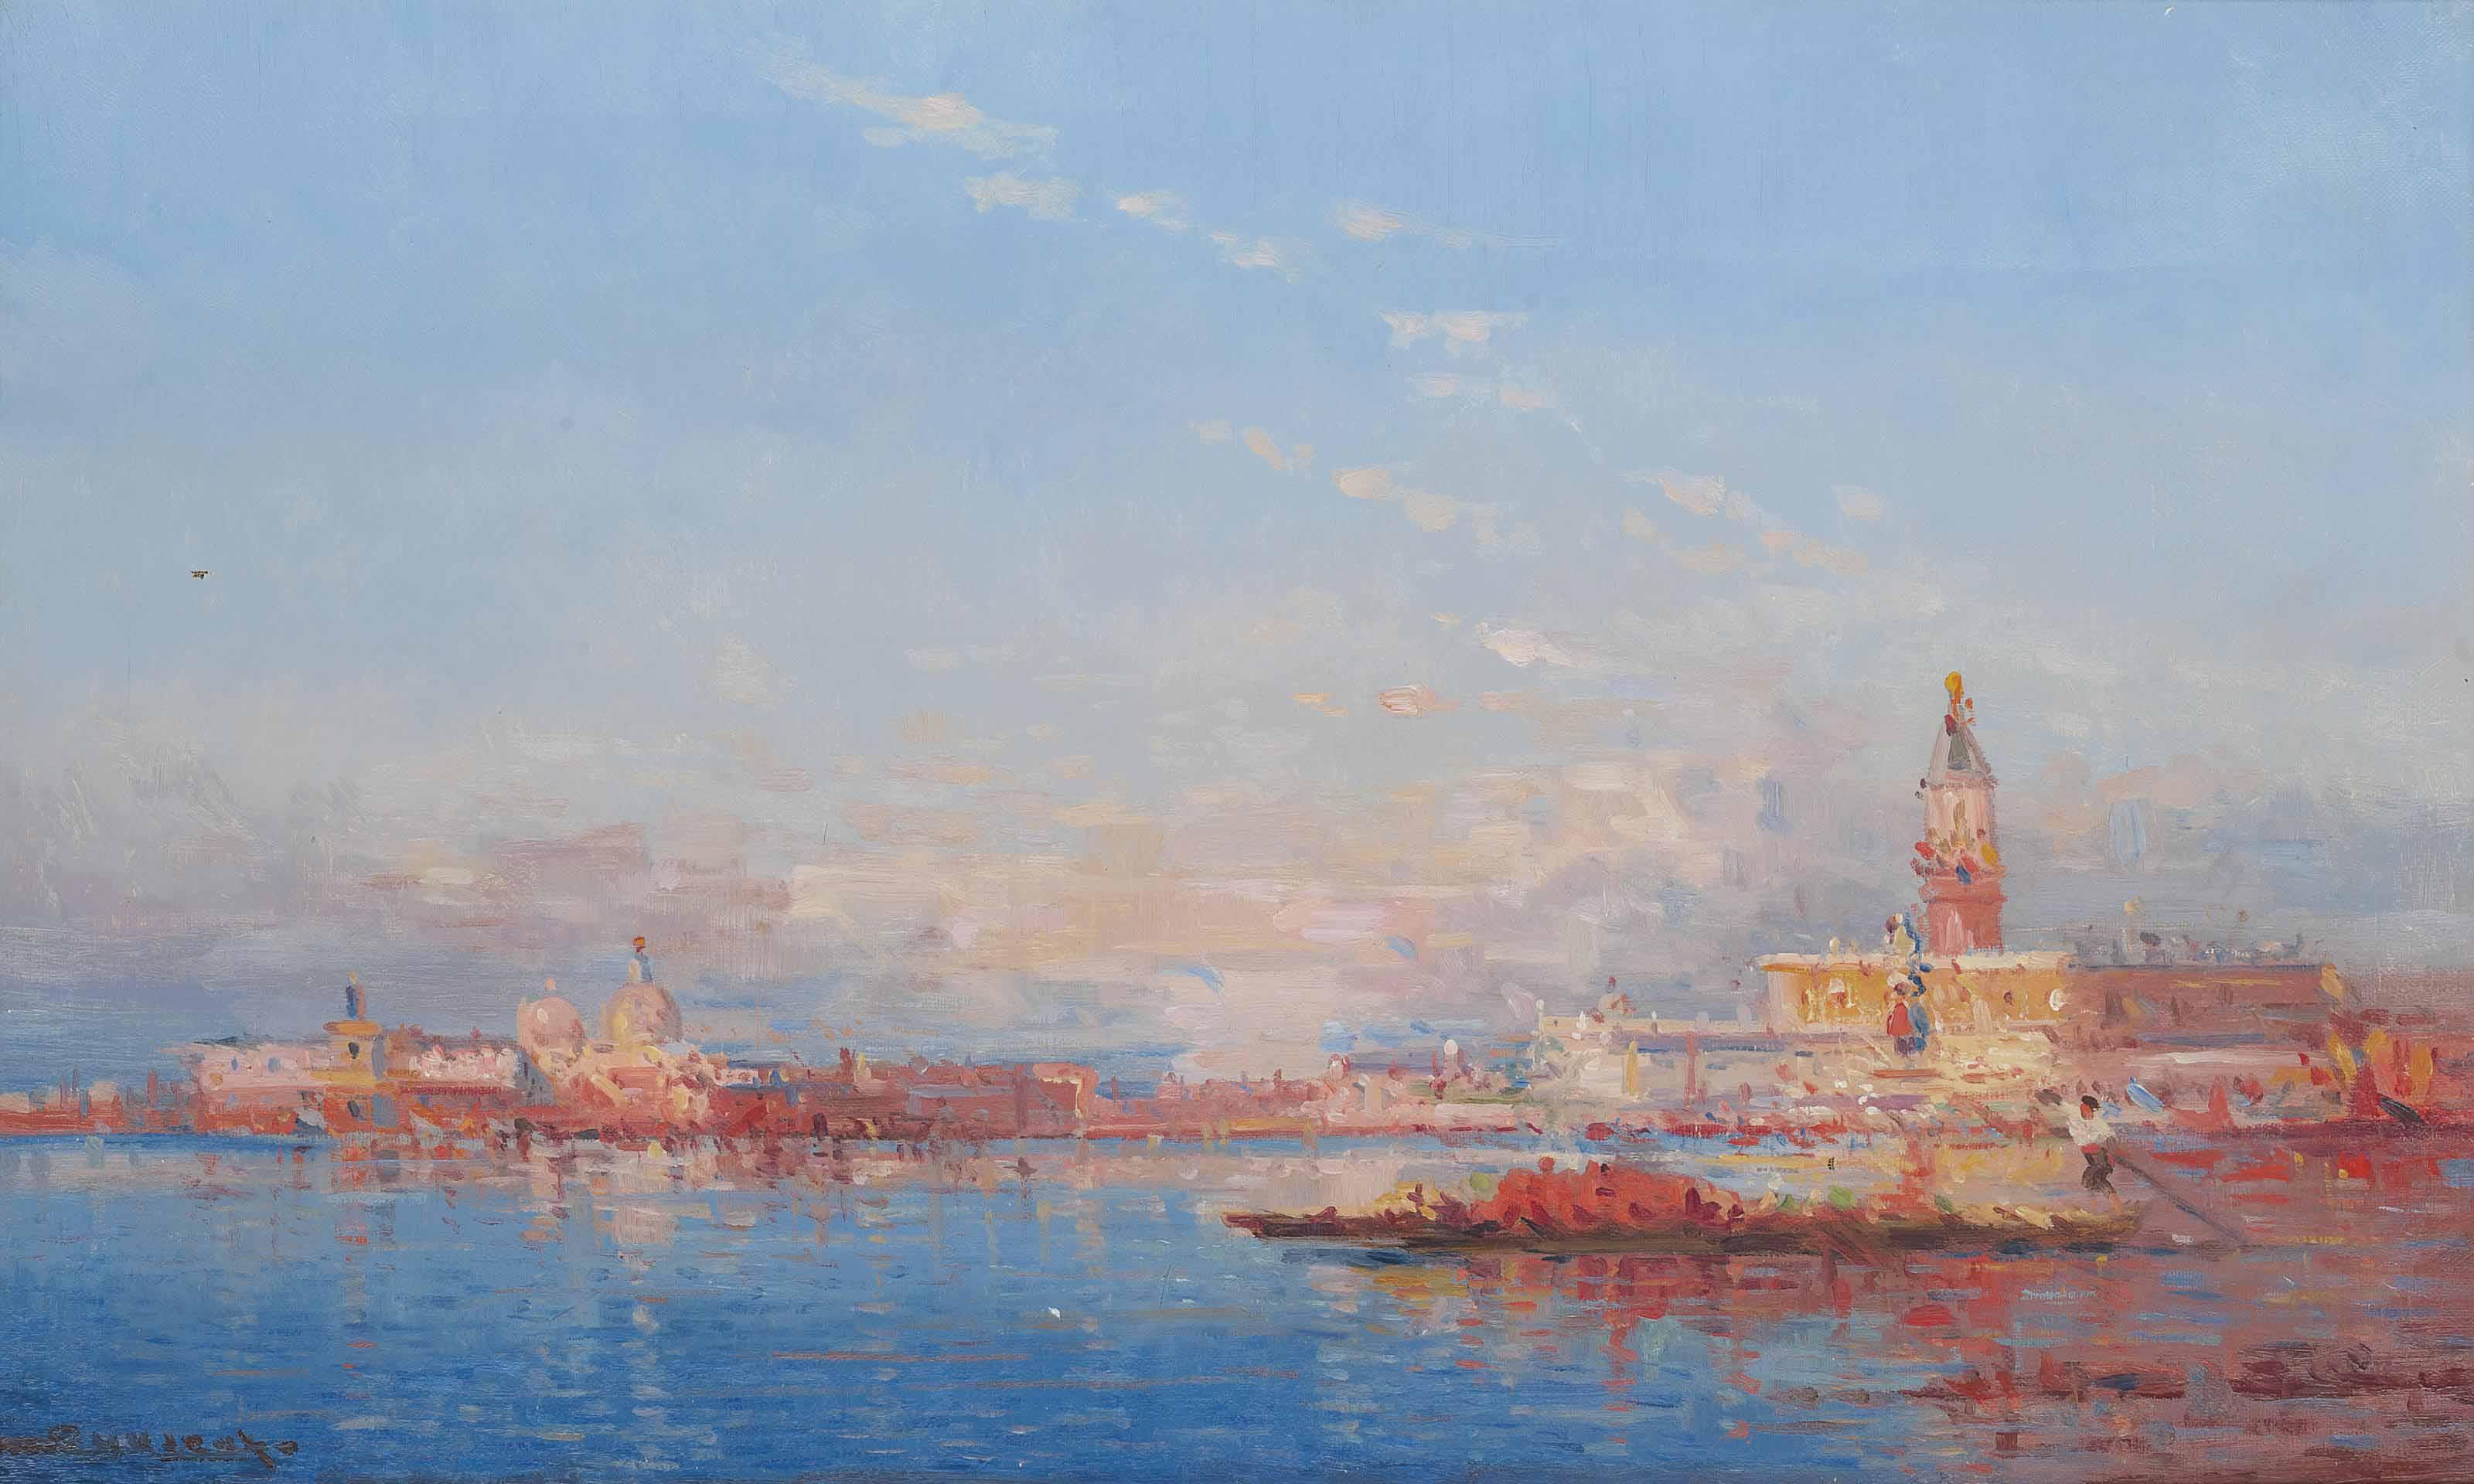 A trading vessel on the Venetian lagoon